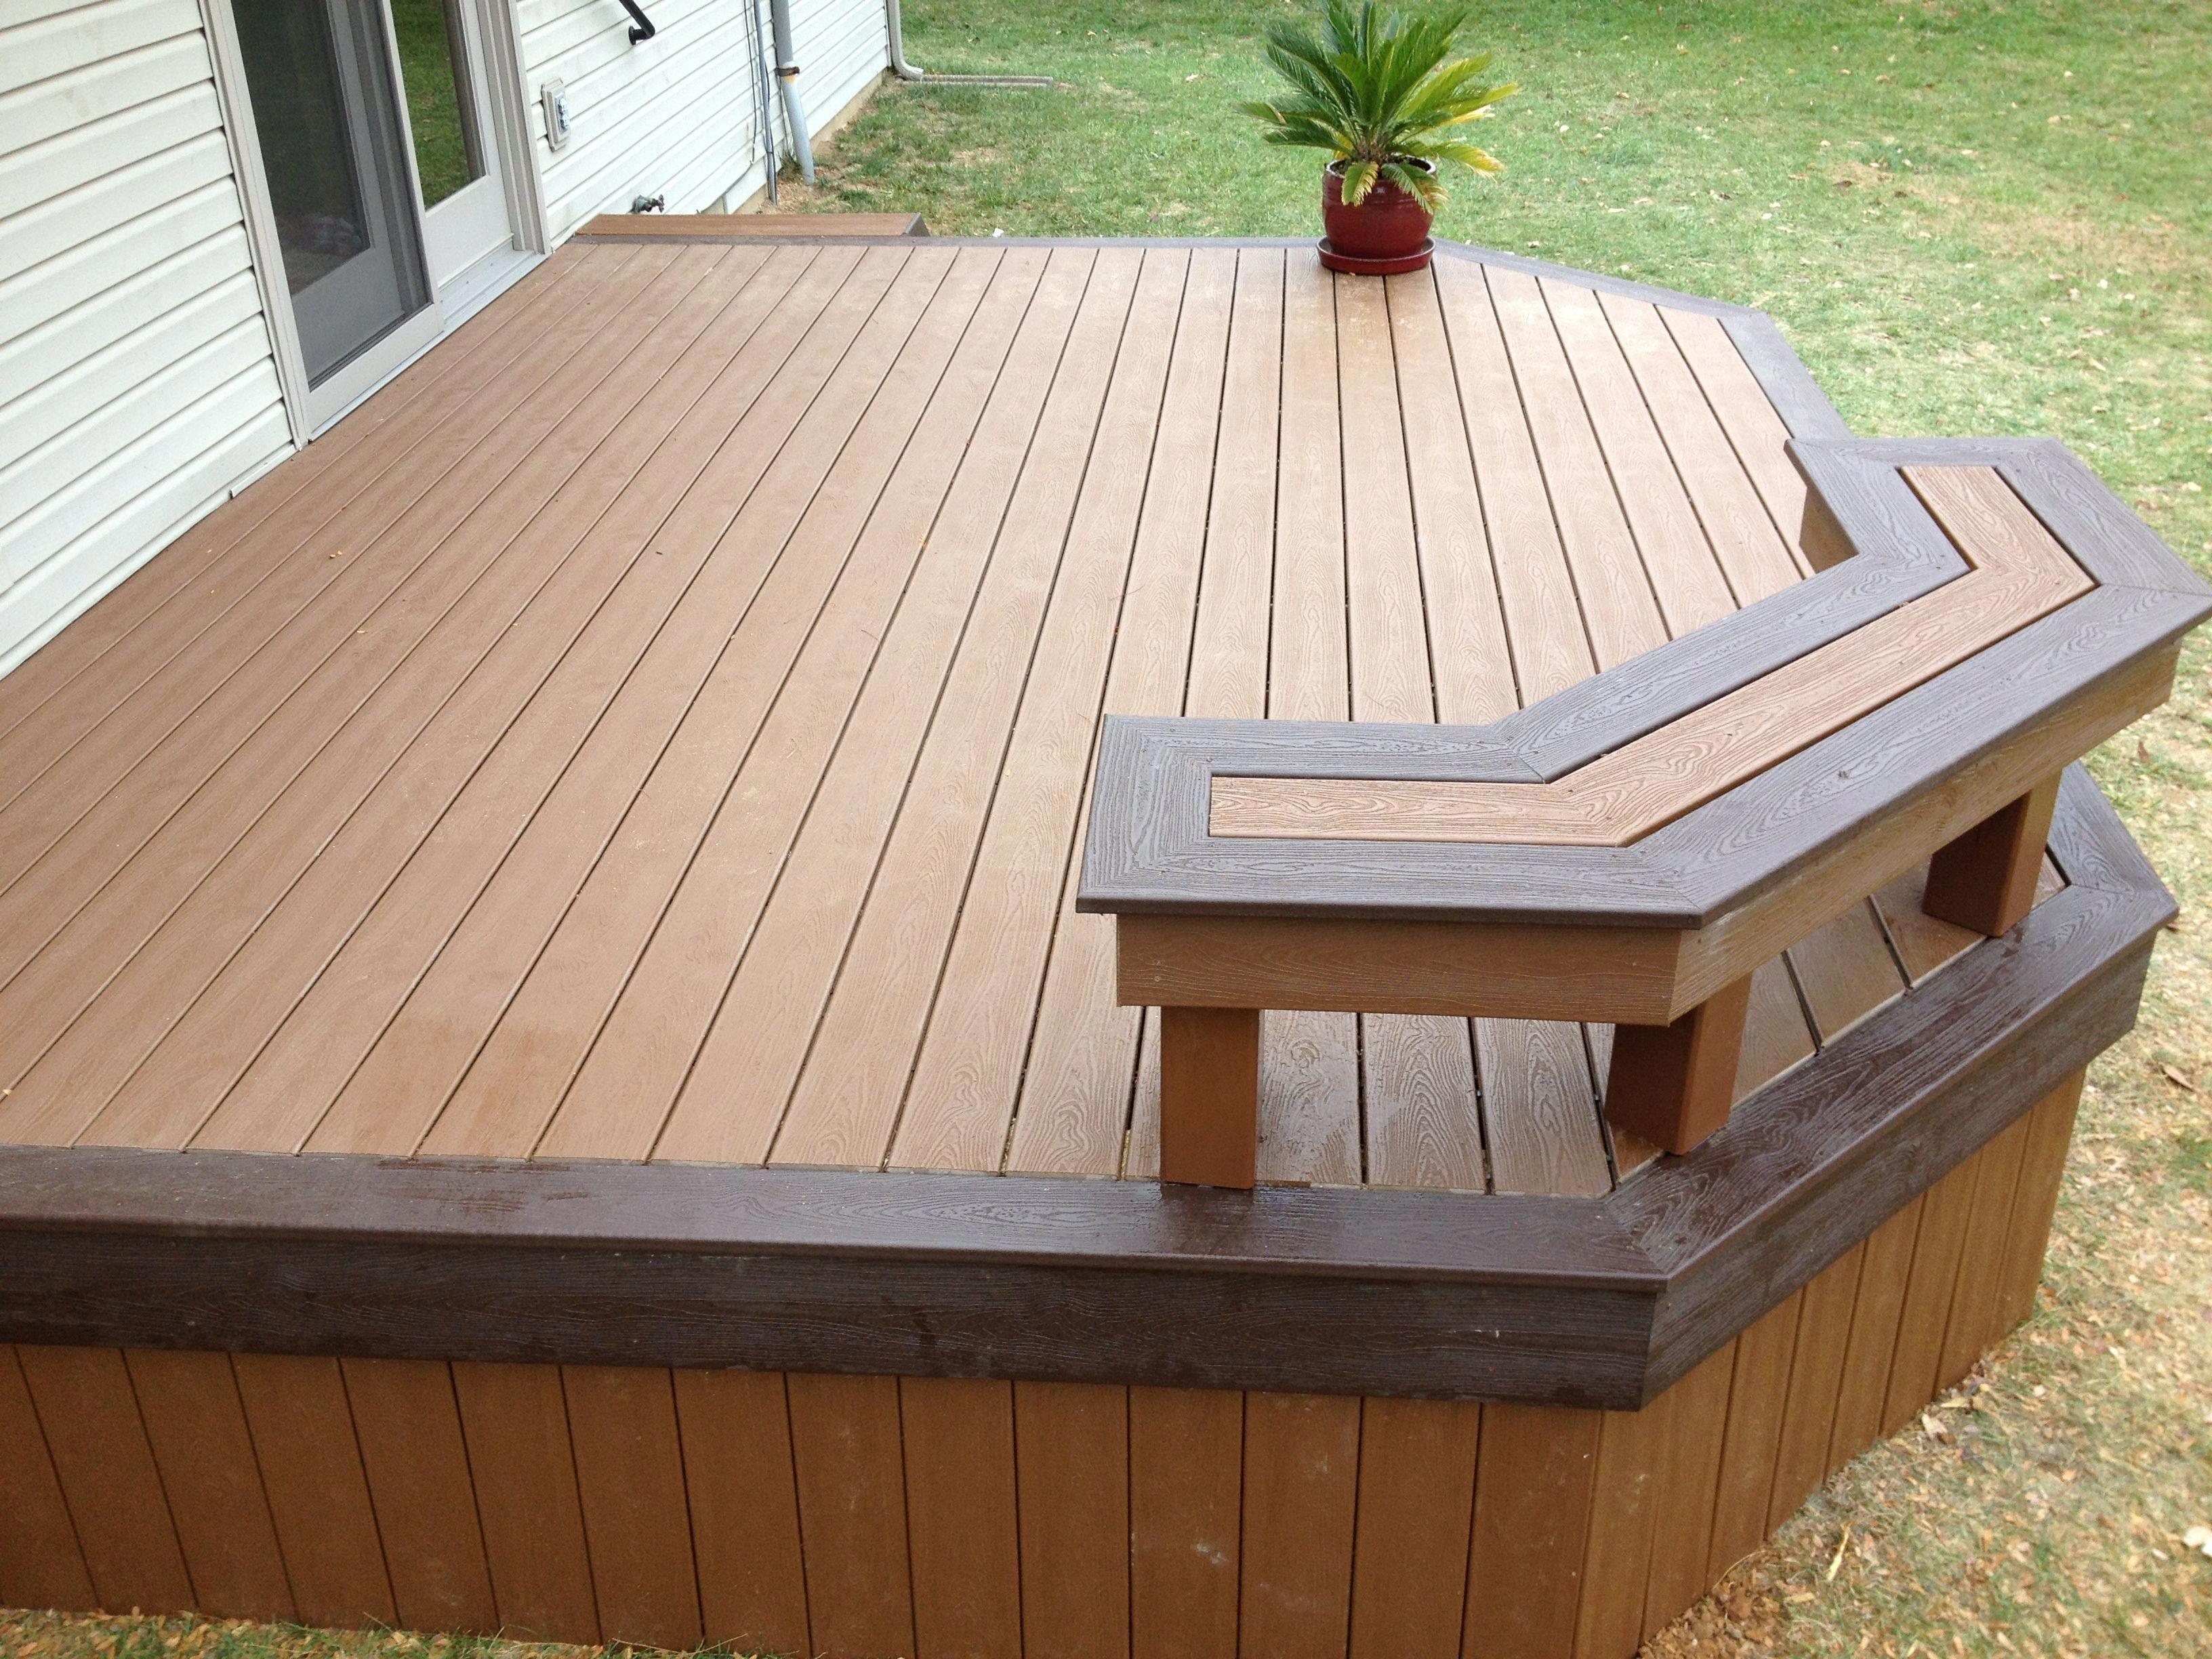 Treehouse Deck With Vintage Lantern Accents And Custom Bench Backyarddeckideasthefamilyhandyma Deck Designs Backyard Concrete Patio Designs Patio Deck Designs